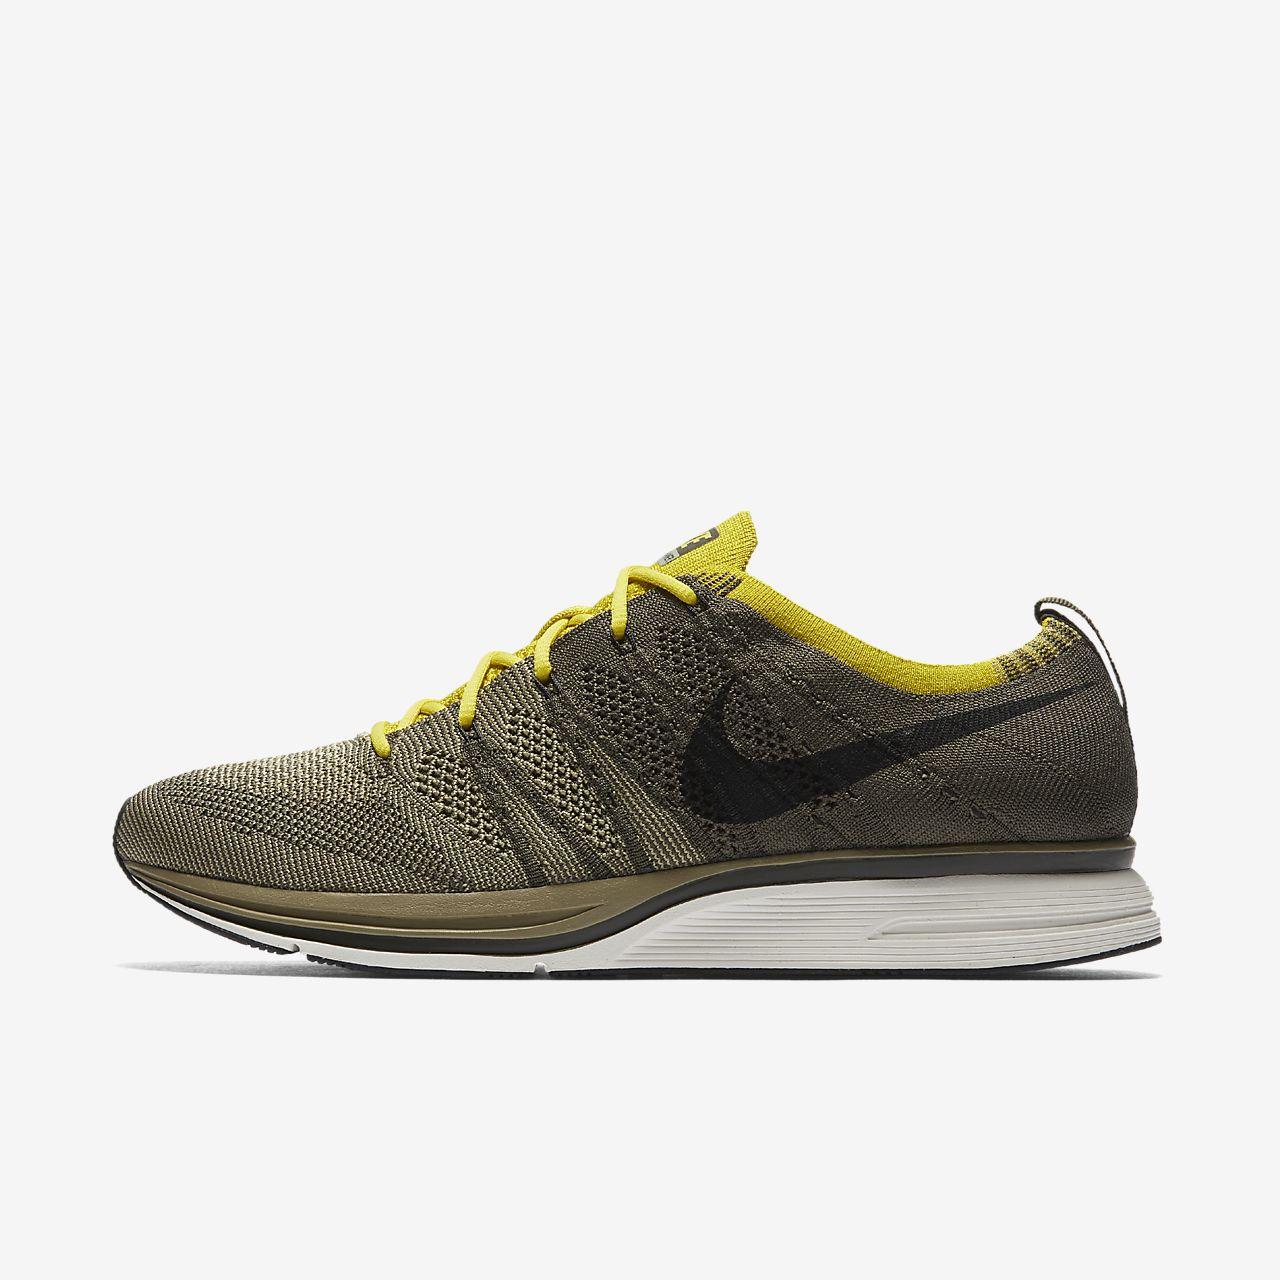 Sko Nike Flyknit Trainer Unisex